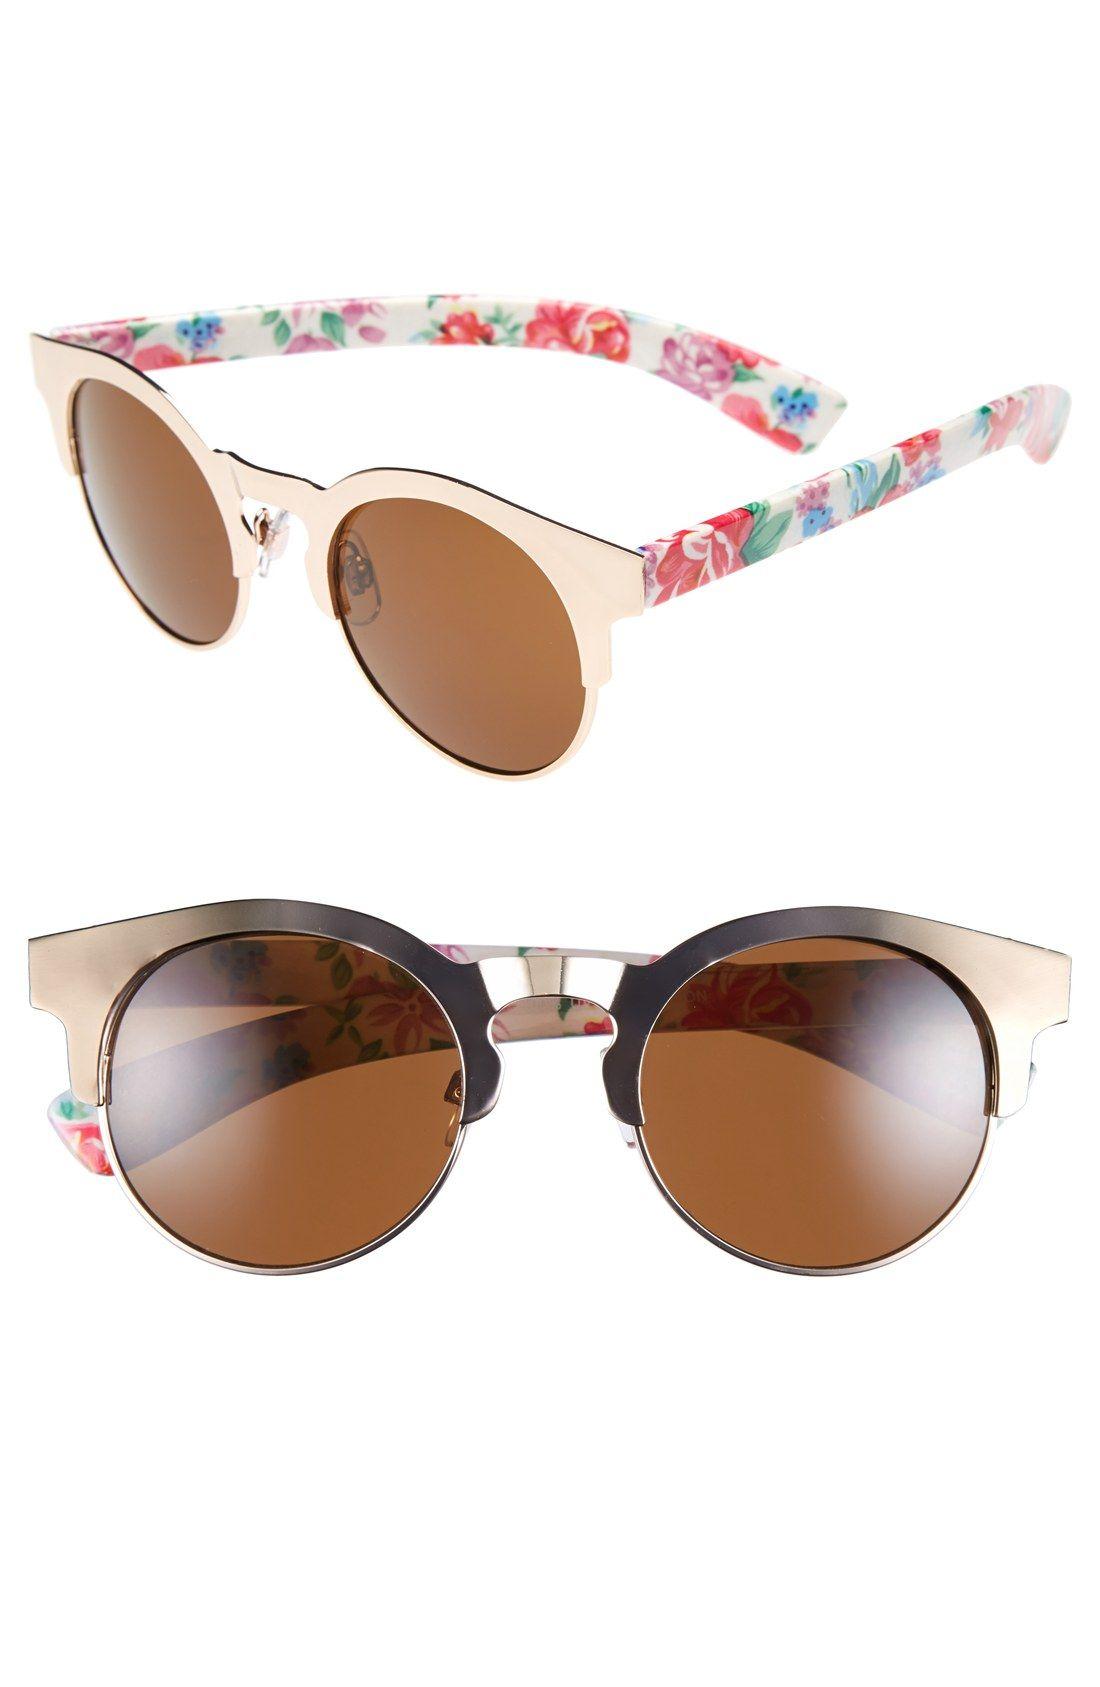 b1f87648bdef1 Vintage glam meets floral Sunglasses